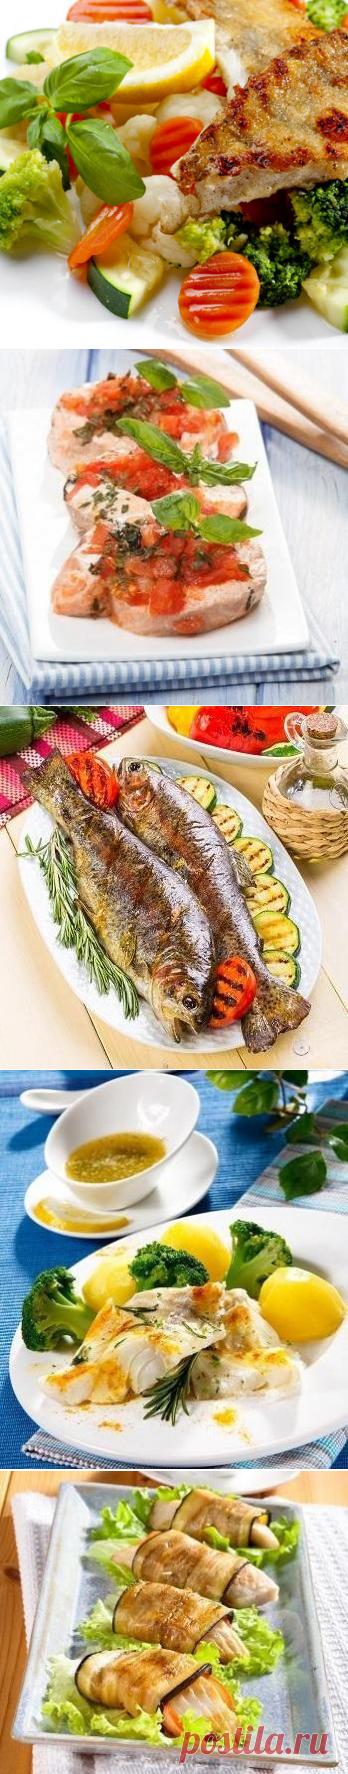 Рыба с овощами: 10 блюд для легкого ужина